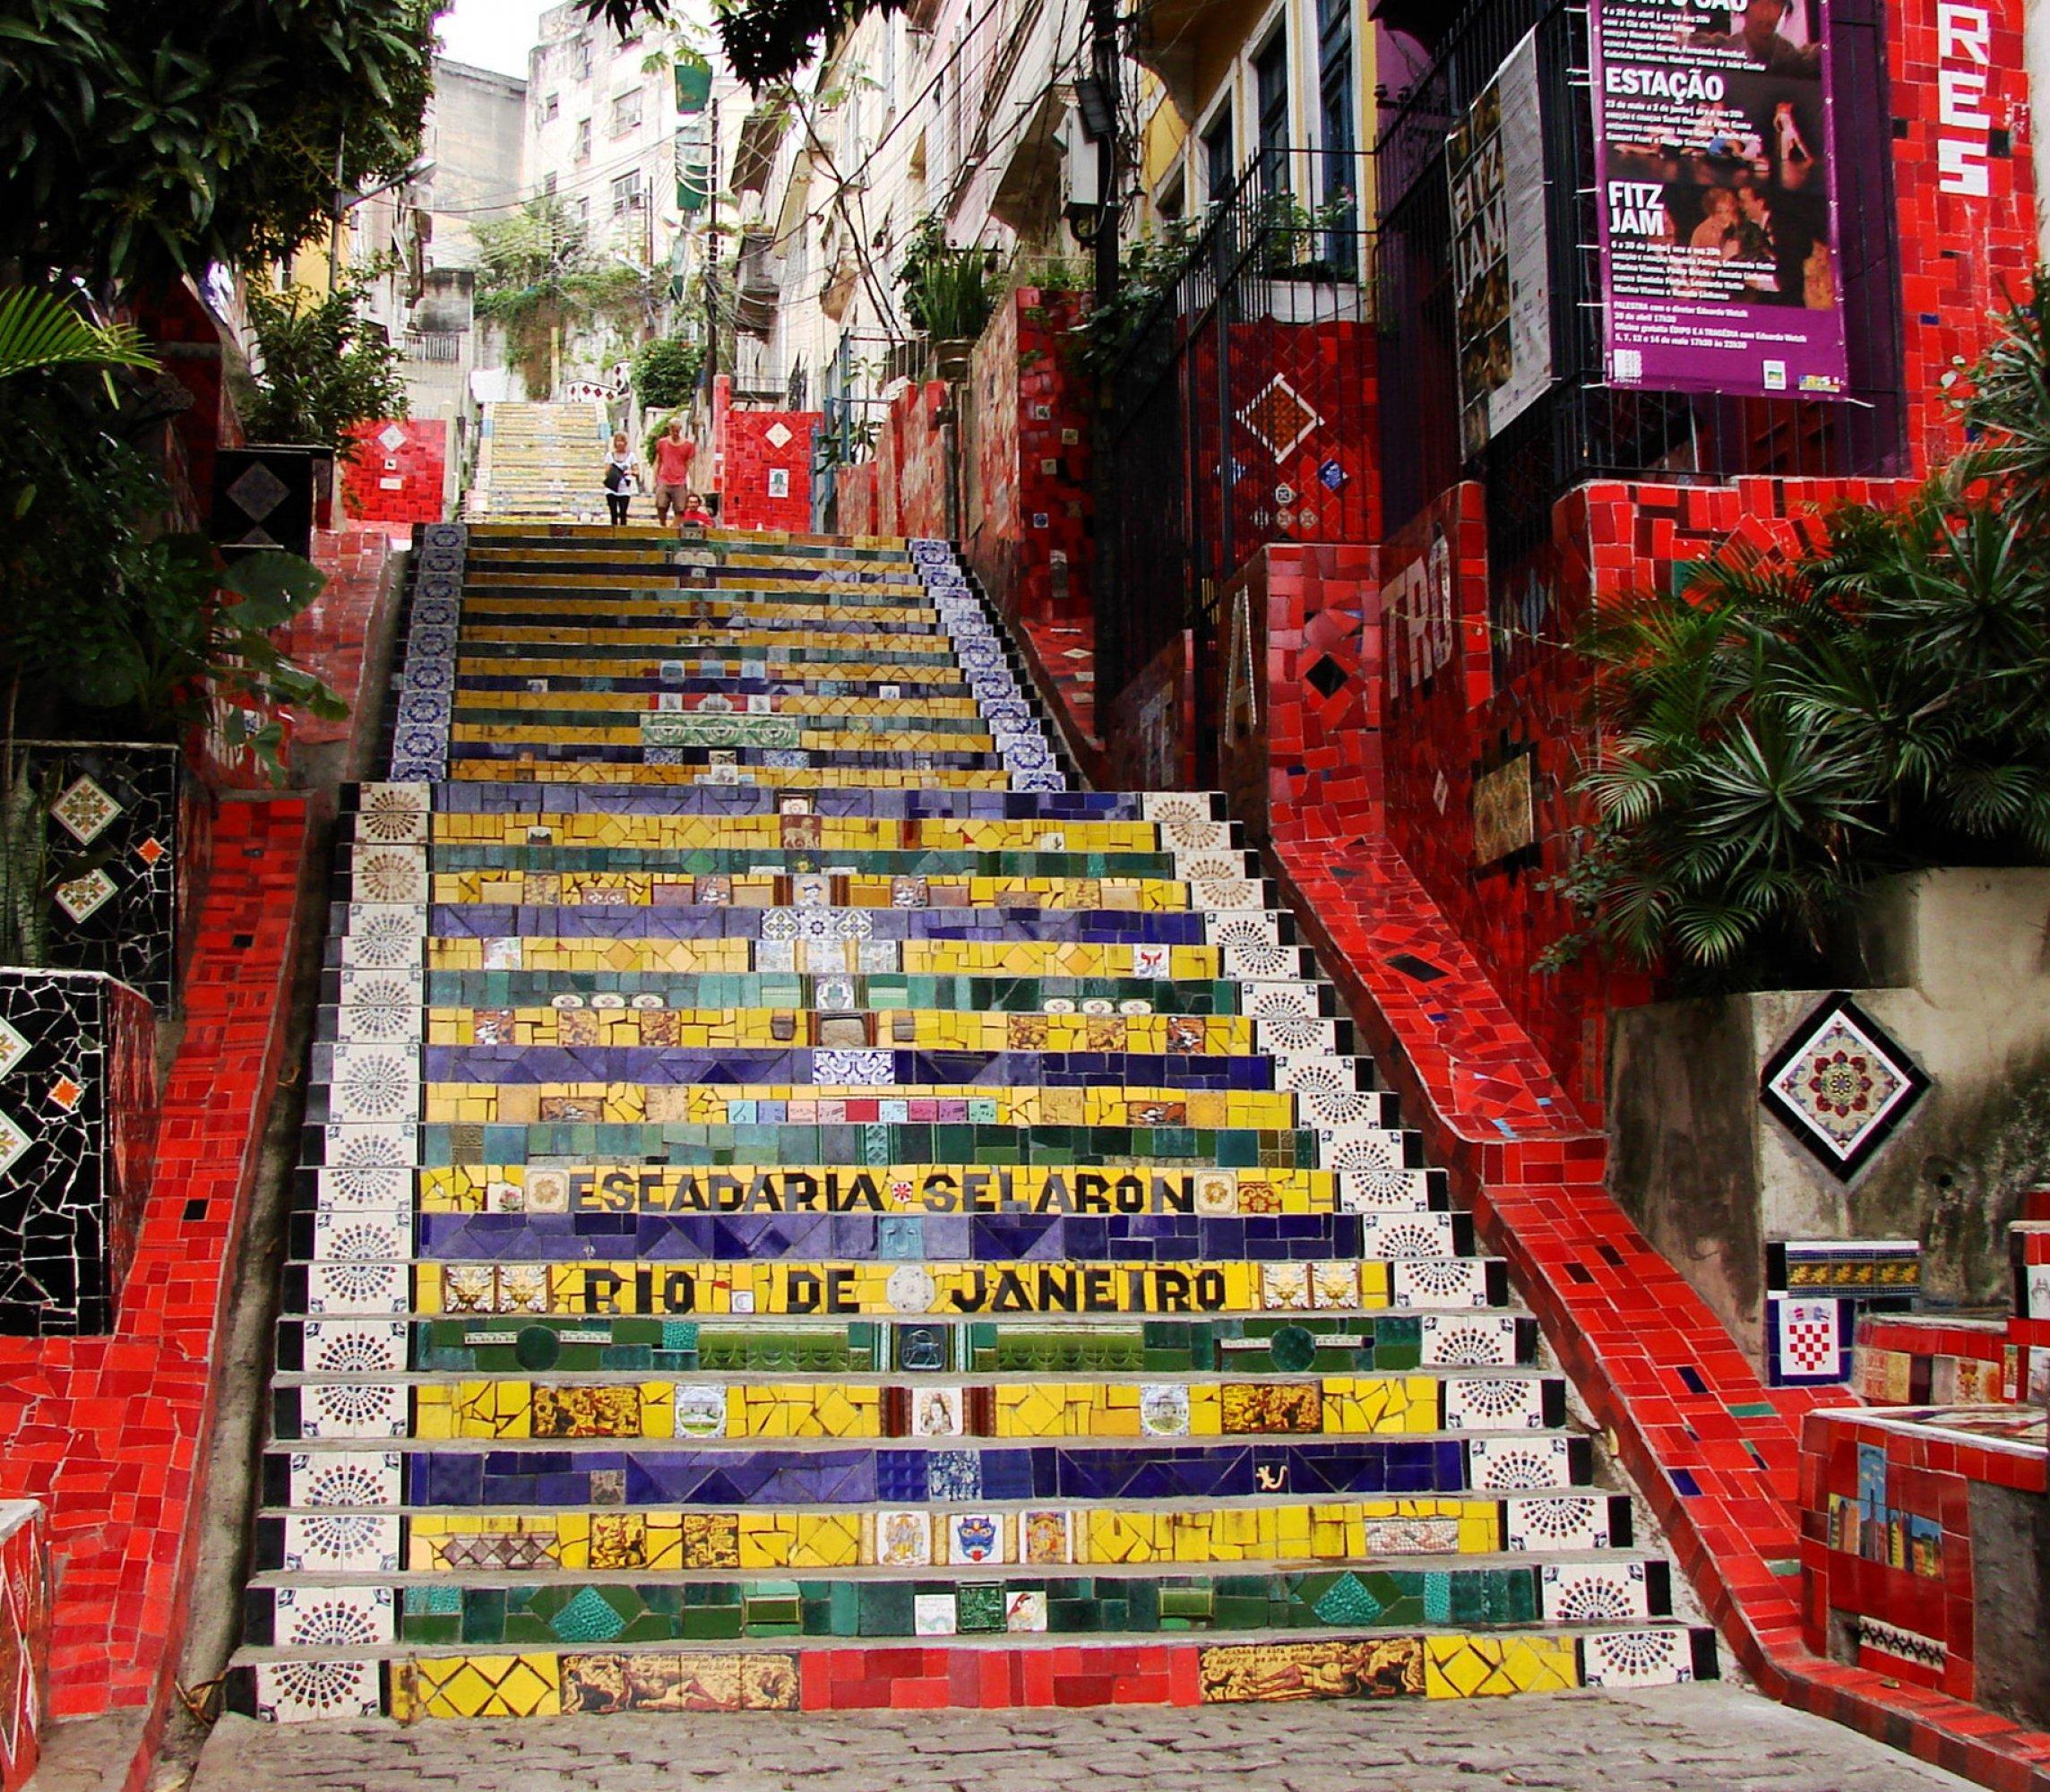 https://bubo.sk/uploads/galleries/7412/rio-selaron-stairs-rio-de-janeiro-brasil.jpg